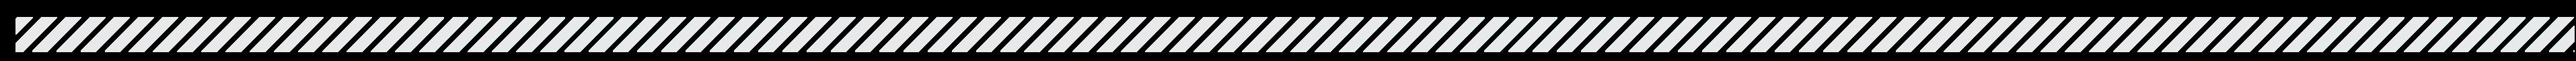 gray divider line 2-1